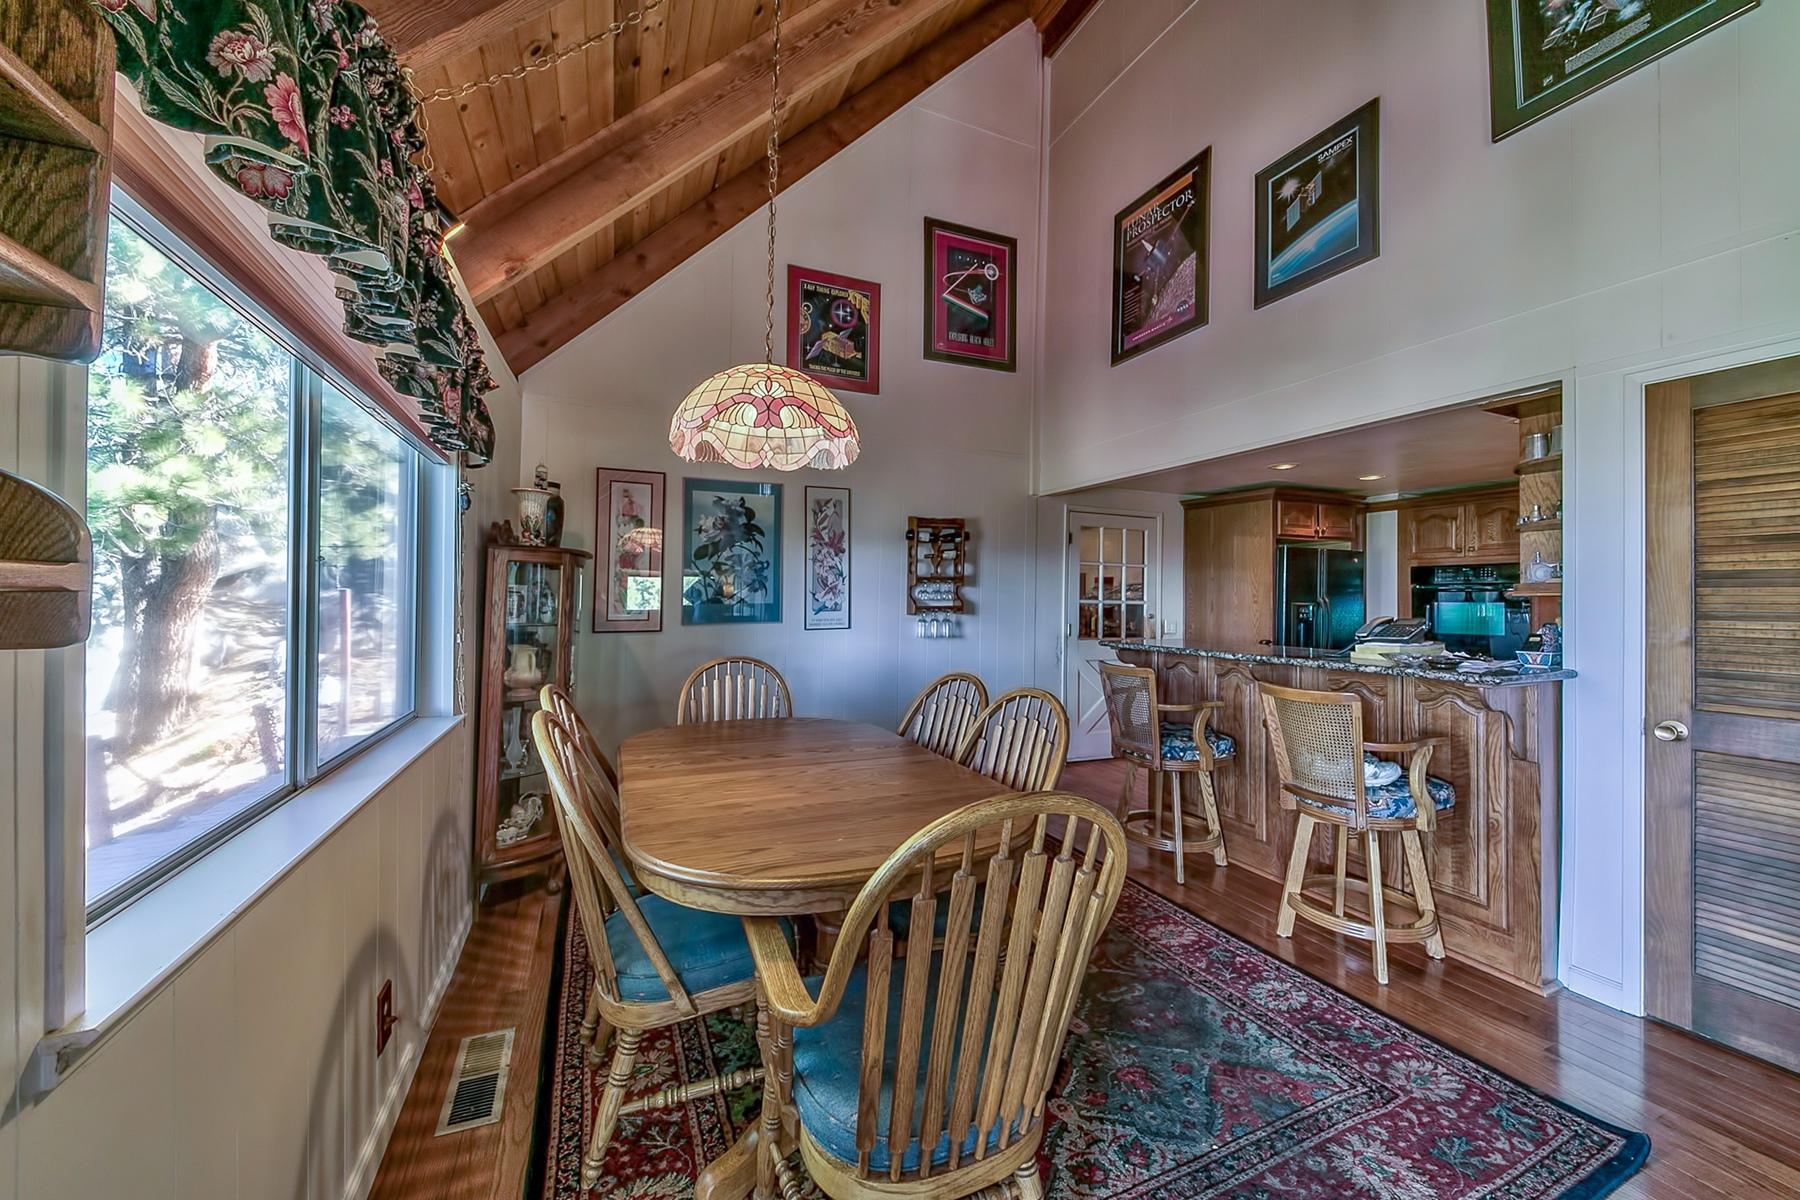 Additional photo for property listing at 194 Hubbard Drive, Stateline, Nevada 89449  Stateline, Nevada 89449 United States